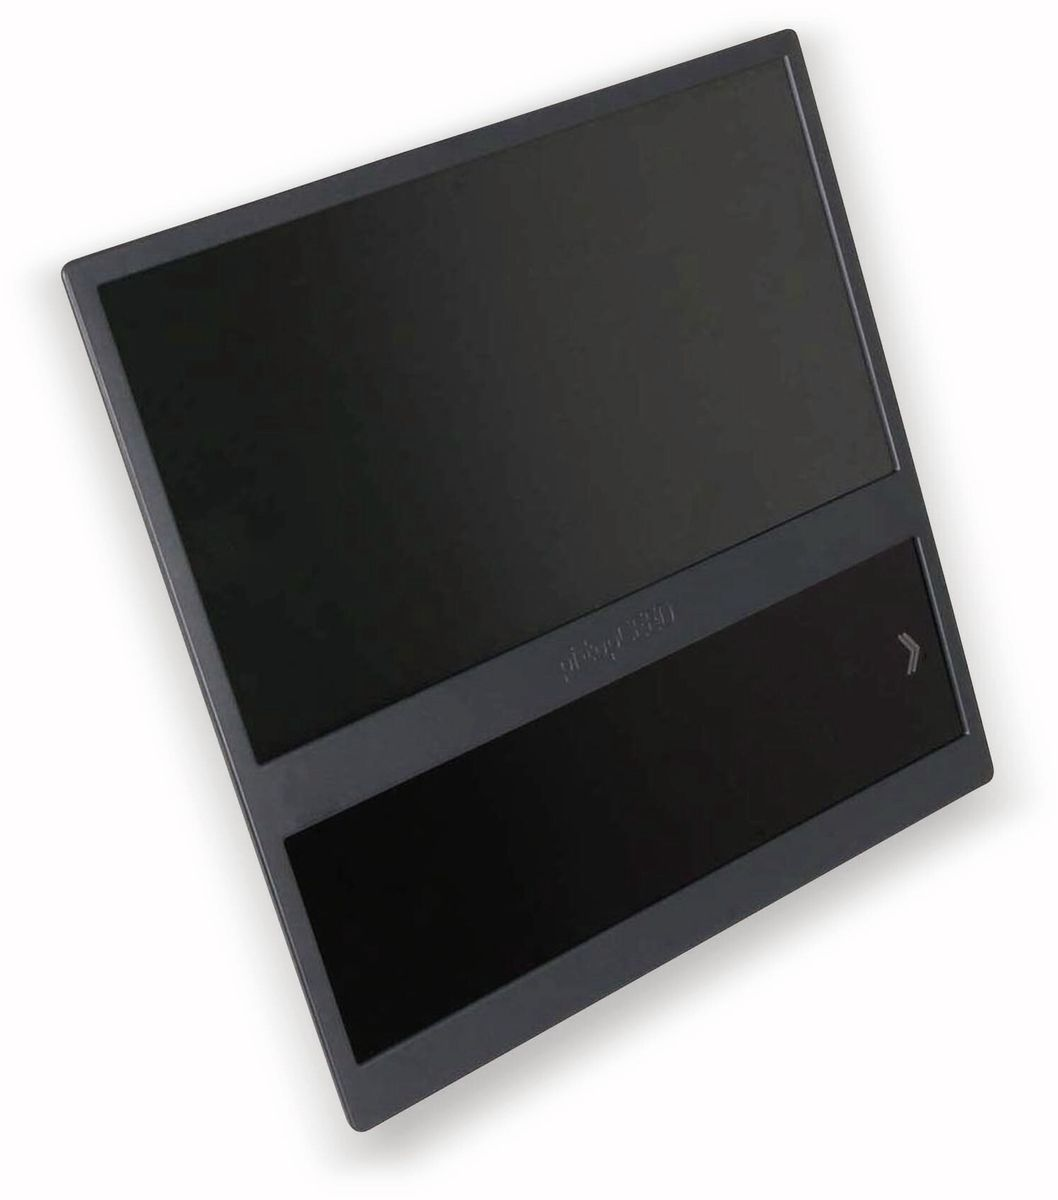 Pitop Ceed Grau für Raspberry Pi 3 B